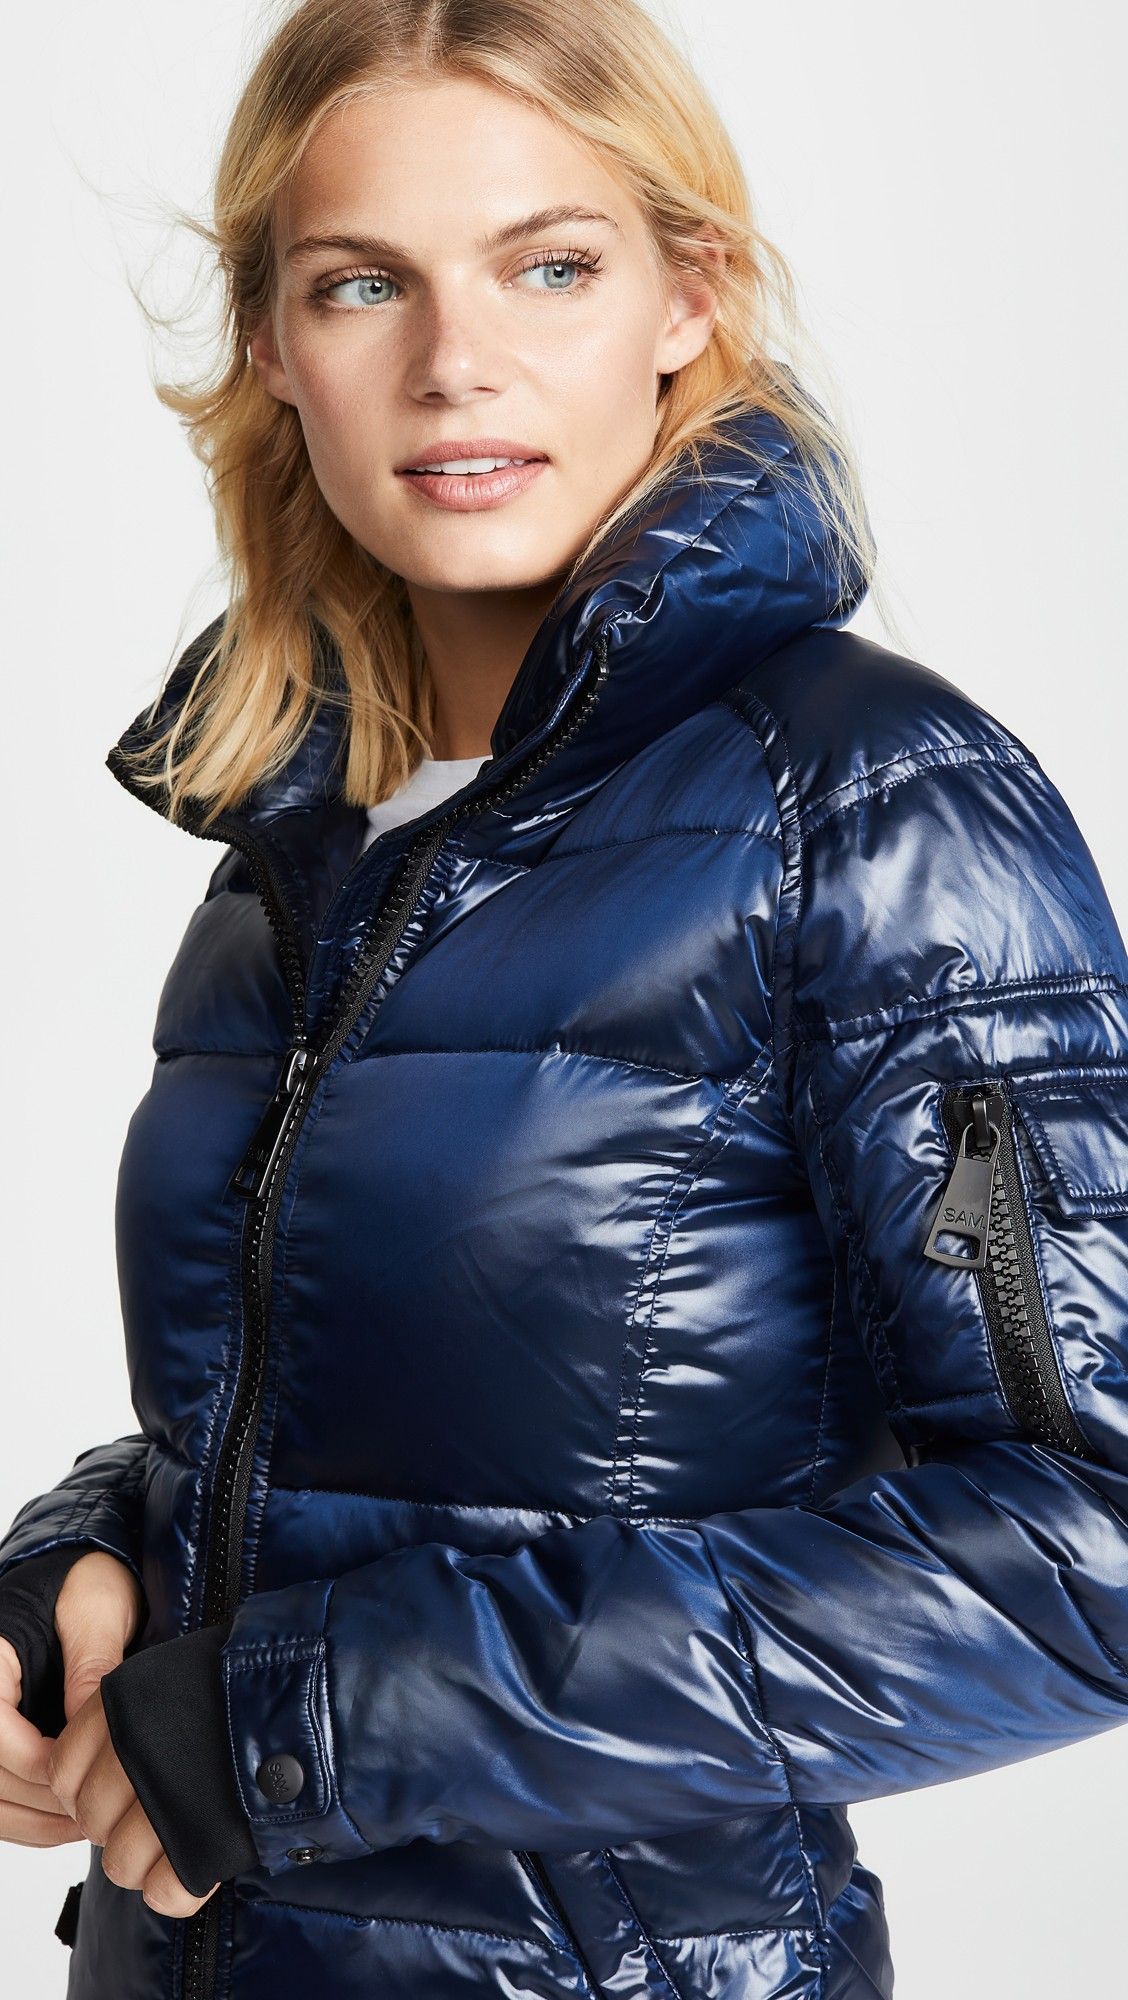 Sam Freestyle Jacket In 2021 Down Jacket Fashion Jackets [ 2000 x 1128 Pixel ]